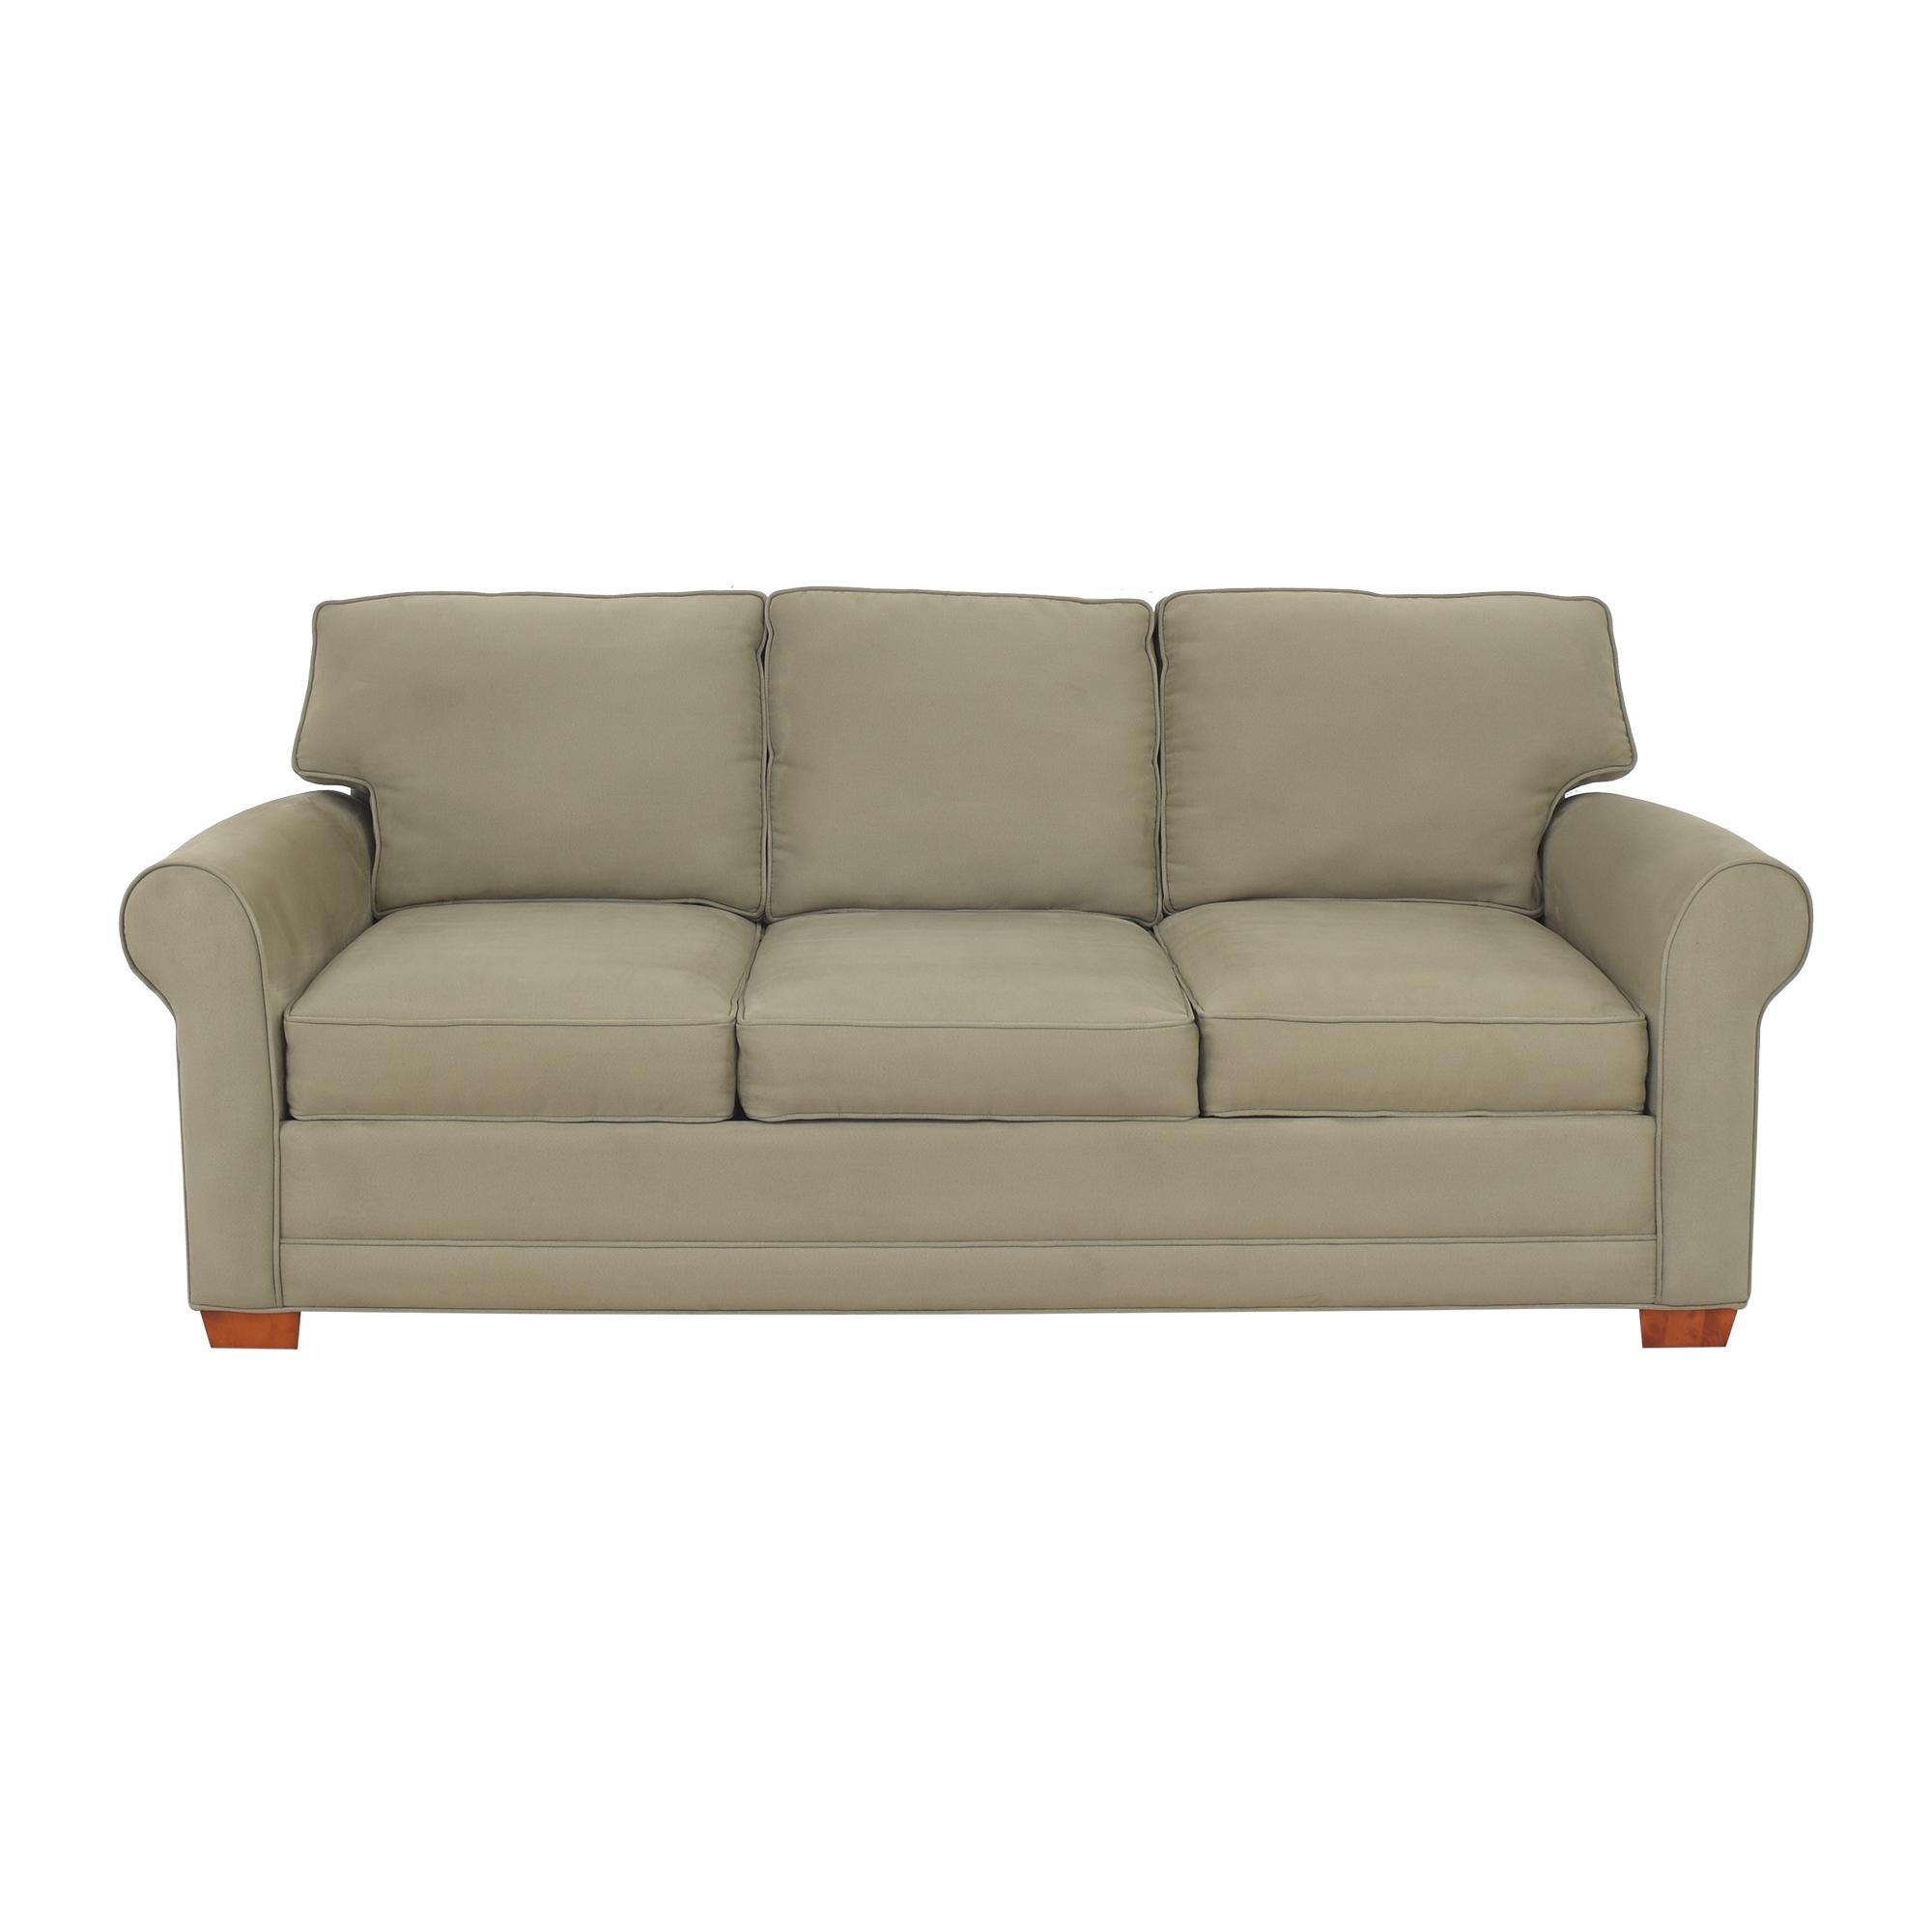 Raymour & Flanigan Raymour & Flanigan Roll Arm Sofa Sofas